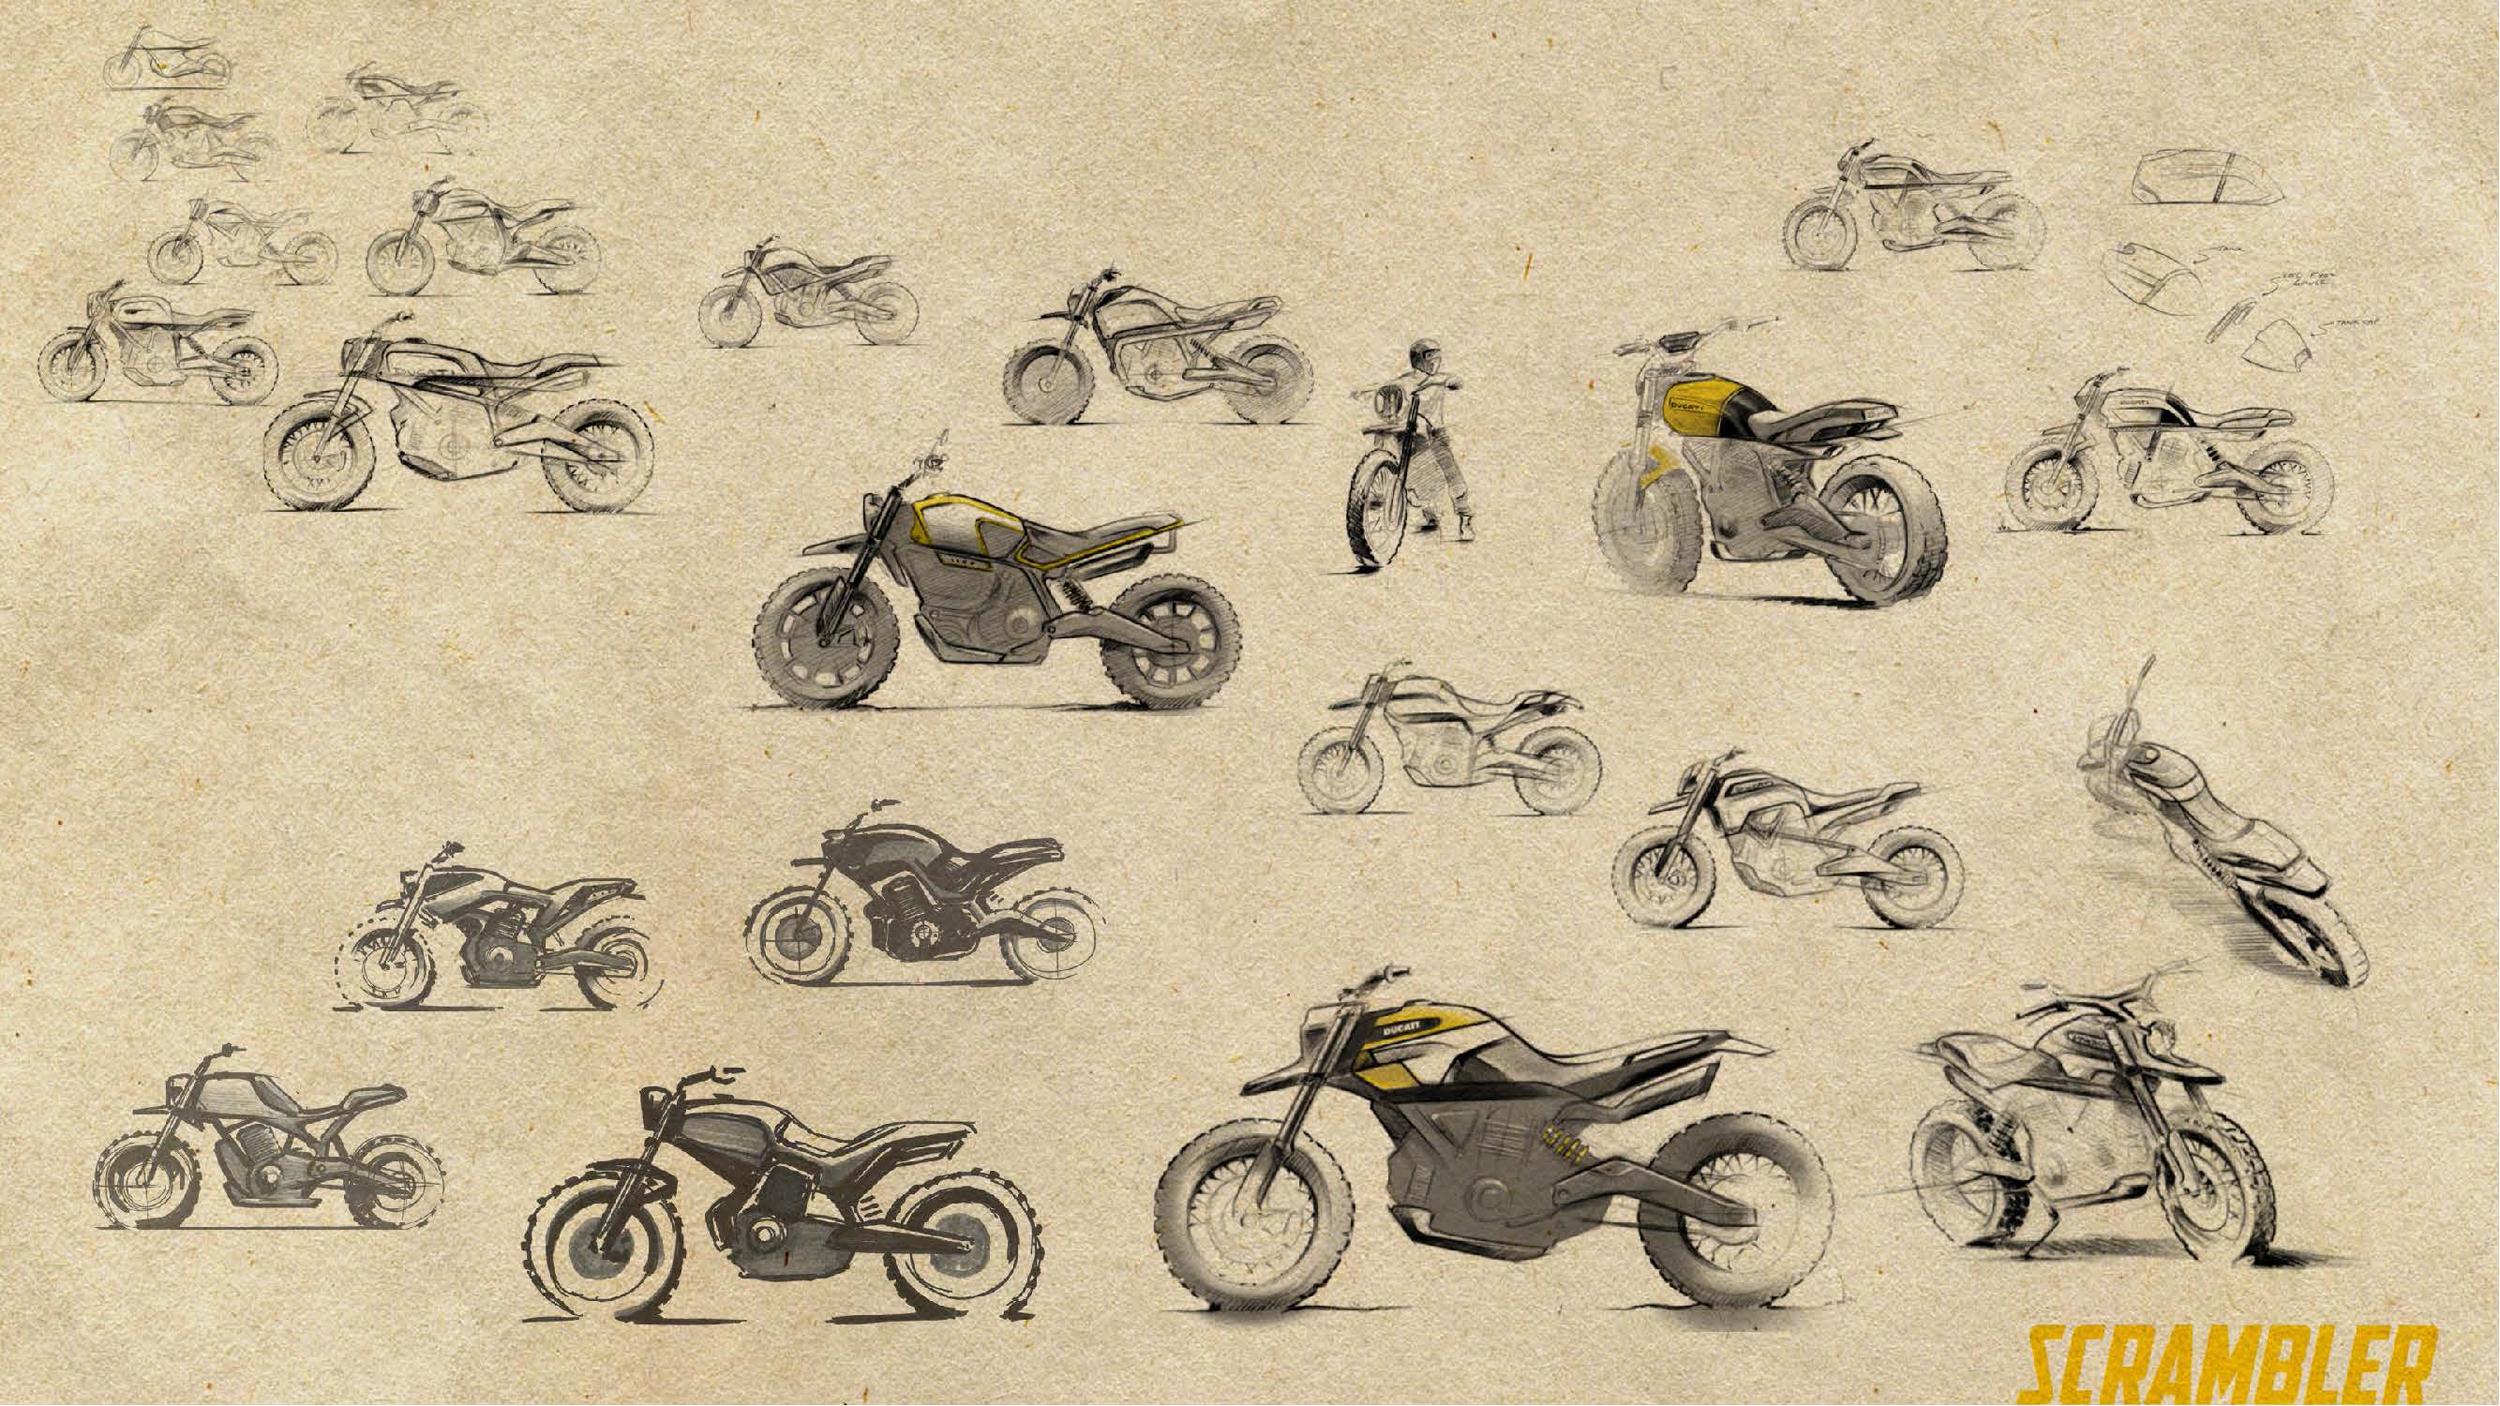 200511 Scrambler Ducati of the future - sketches by Peter Harkins (5)